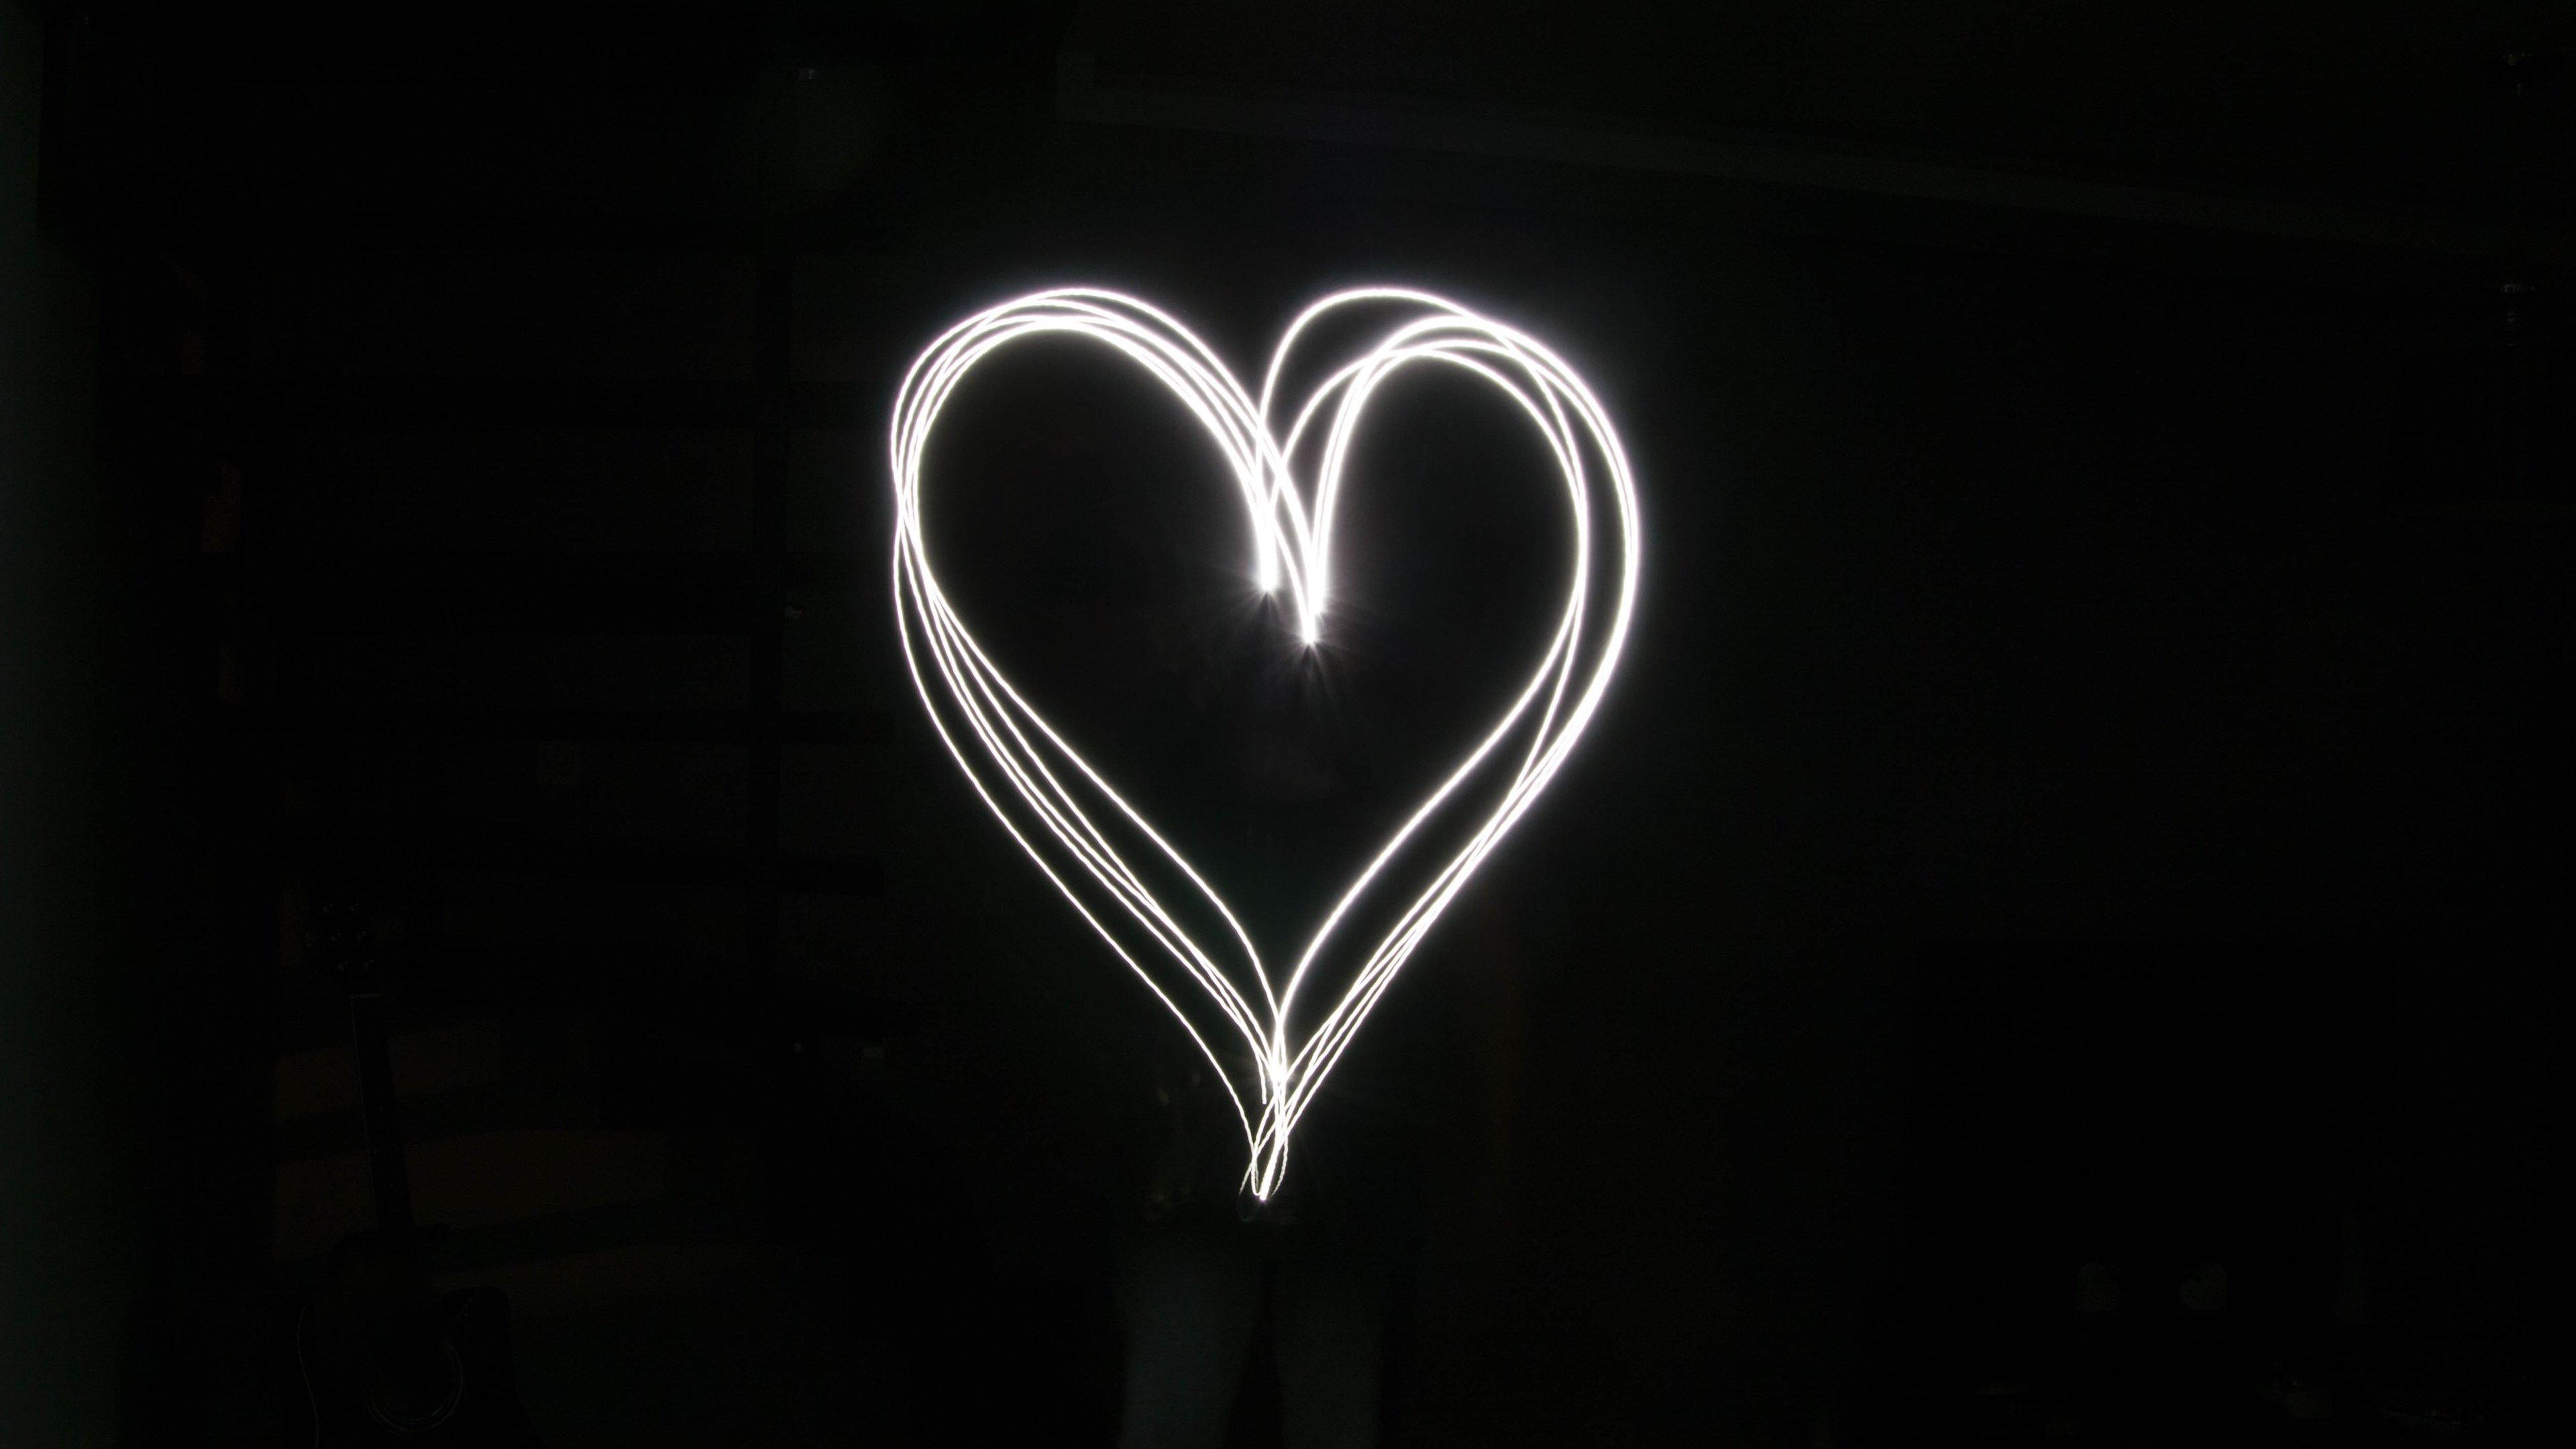 Light Heart Wallpaper  iPhone Android  Desktop Backgrounds